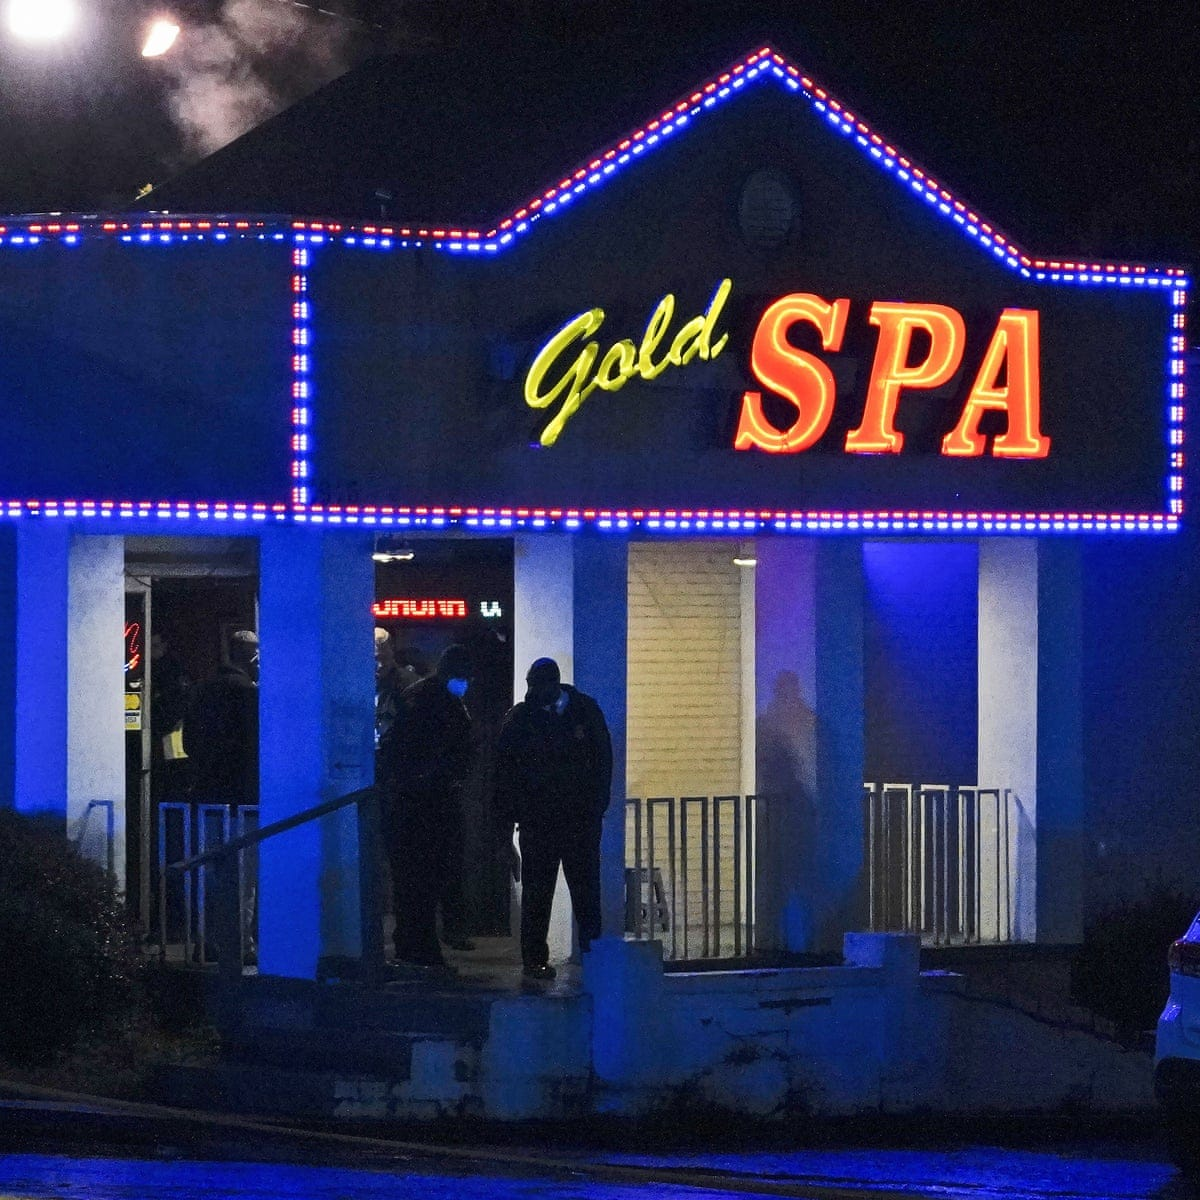 Atlanta massage parlor shootings leave eight dead including six Asian women  | Atlanta | The Guardian